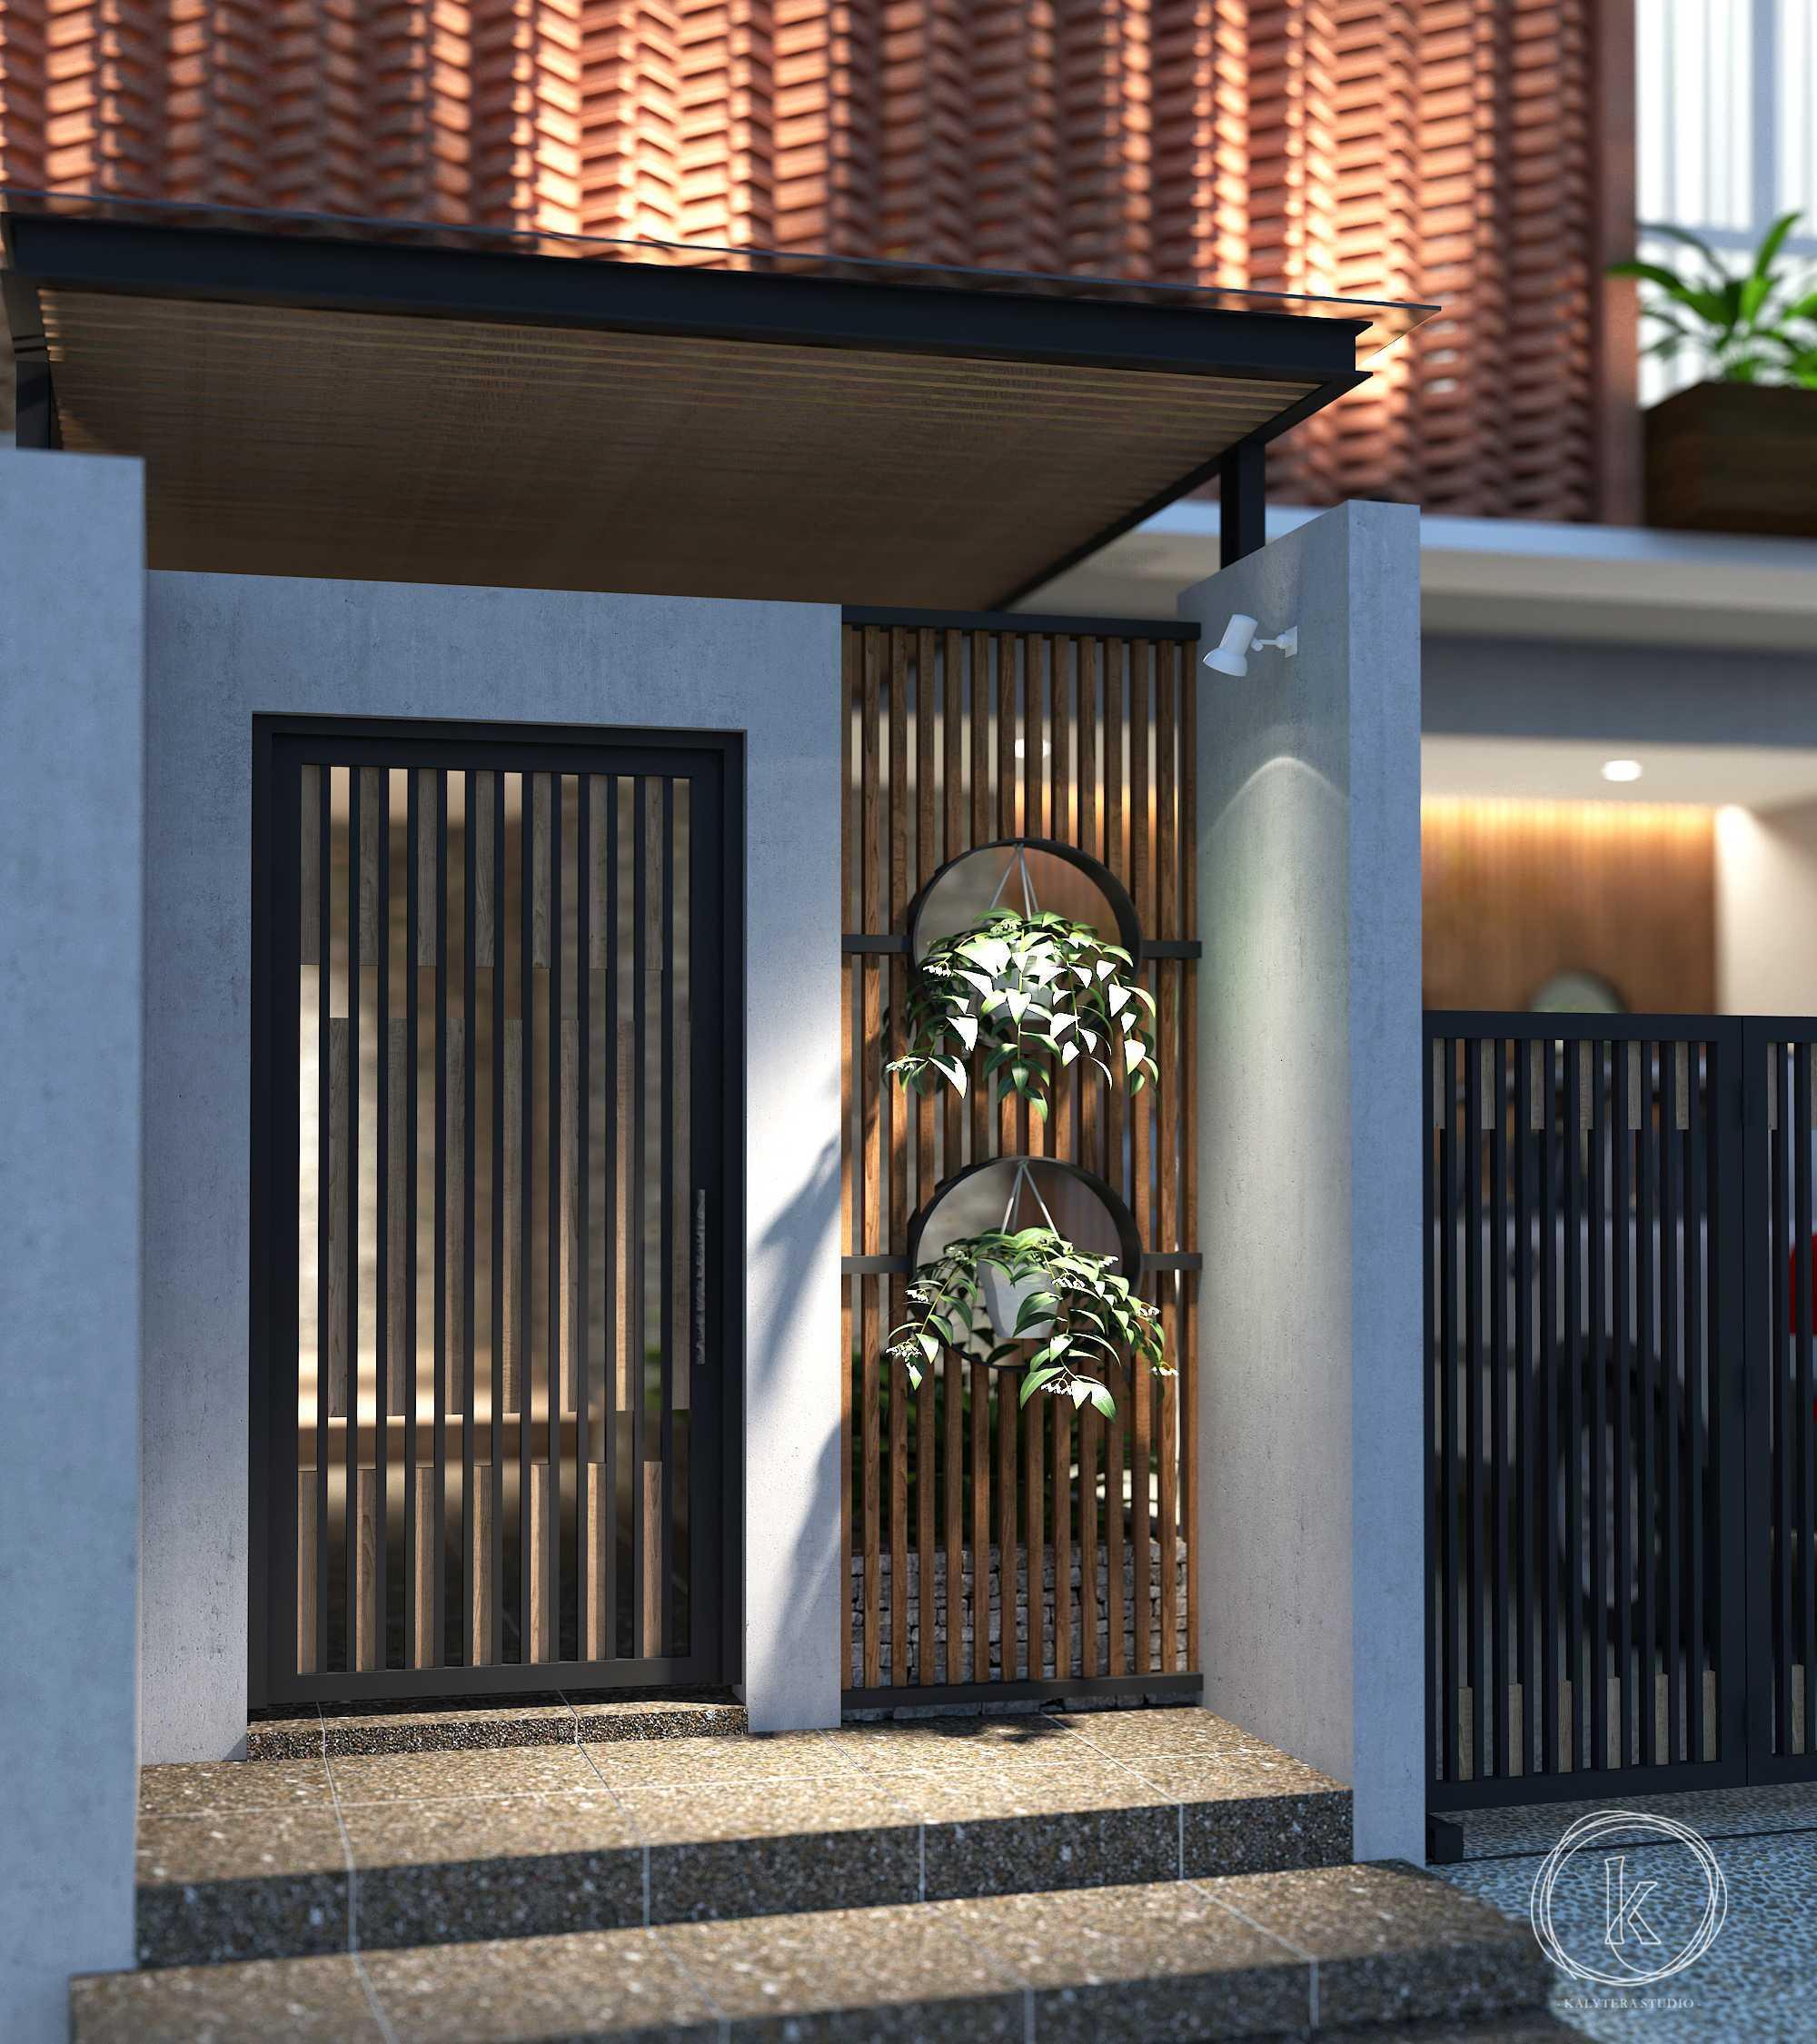 Kalytera Studio Fd-House Surakarta, Kota Surakarta, Jawa Tengah, Indonesia Surakarta, Kota Surakarta, Jawa Tengah, Indonesia Kalytera-Studio-Fd-House   51323